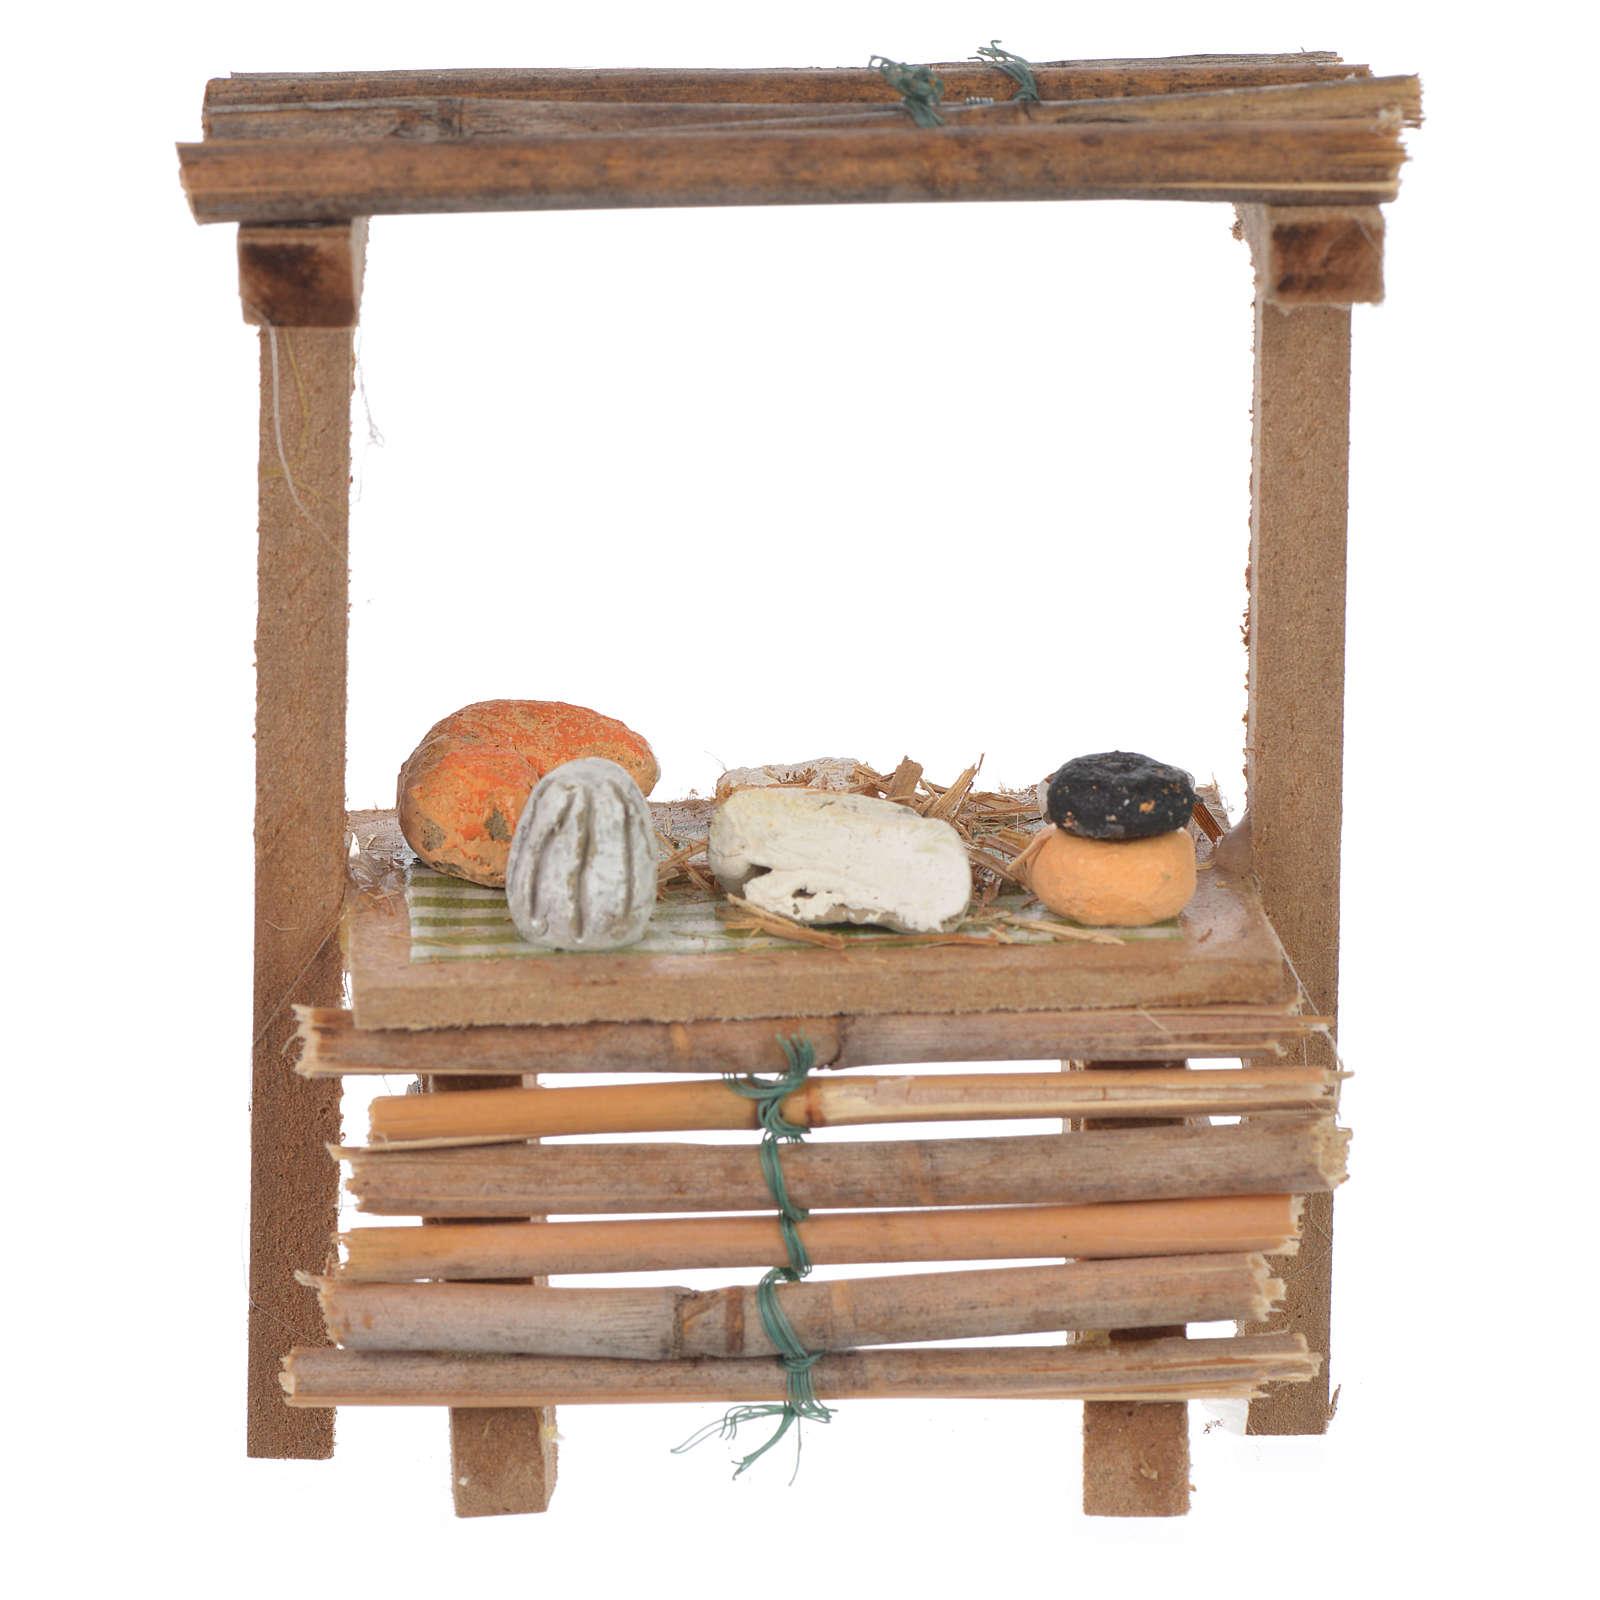 Banco legno formaggi cera presepe 9x10x4,5 cm 4